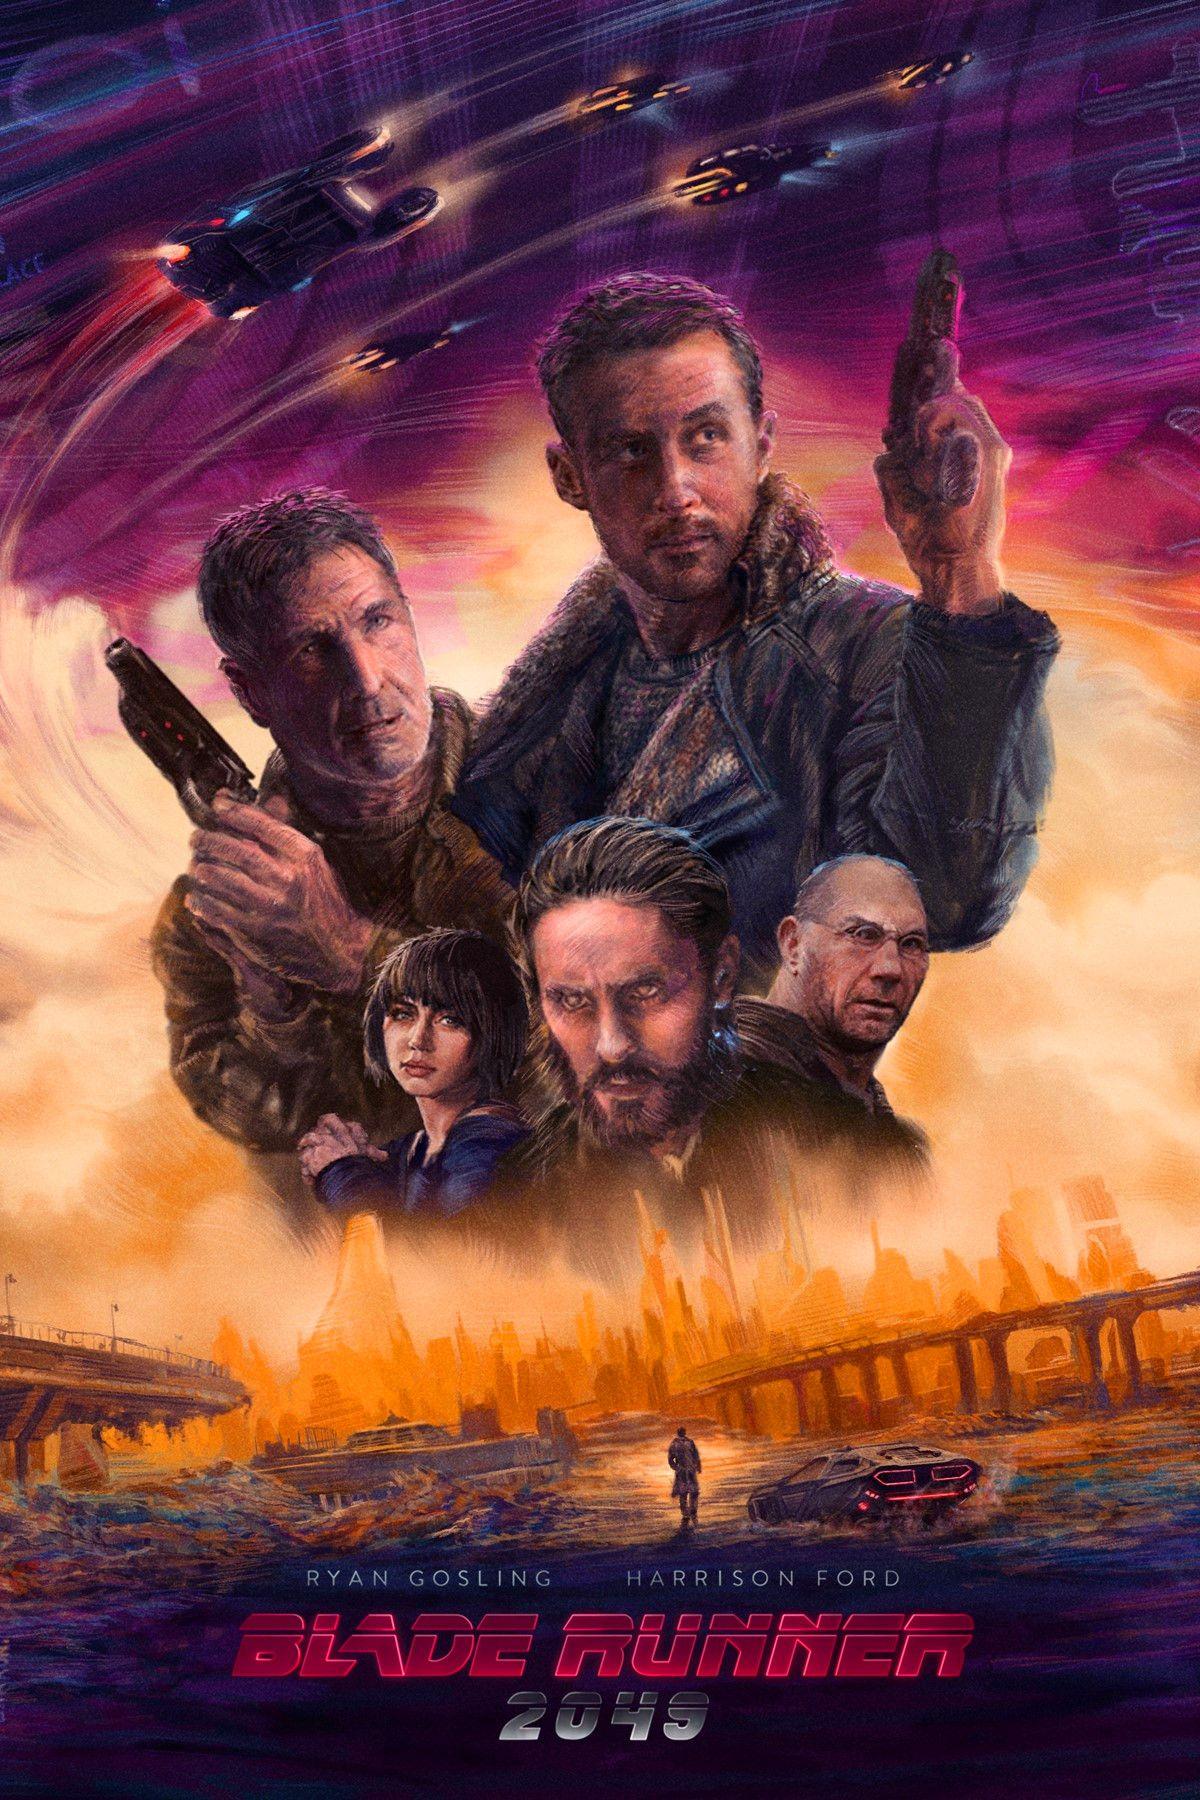 Blade Runner 2049 Blade Runner Blade Runner 2049 Movie Art